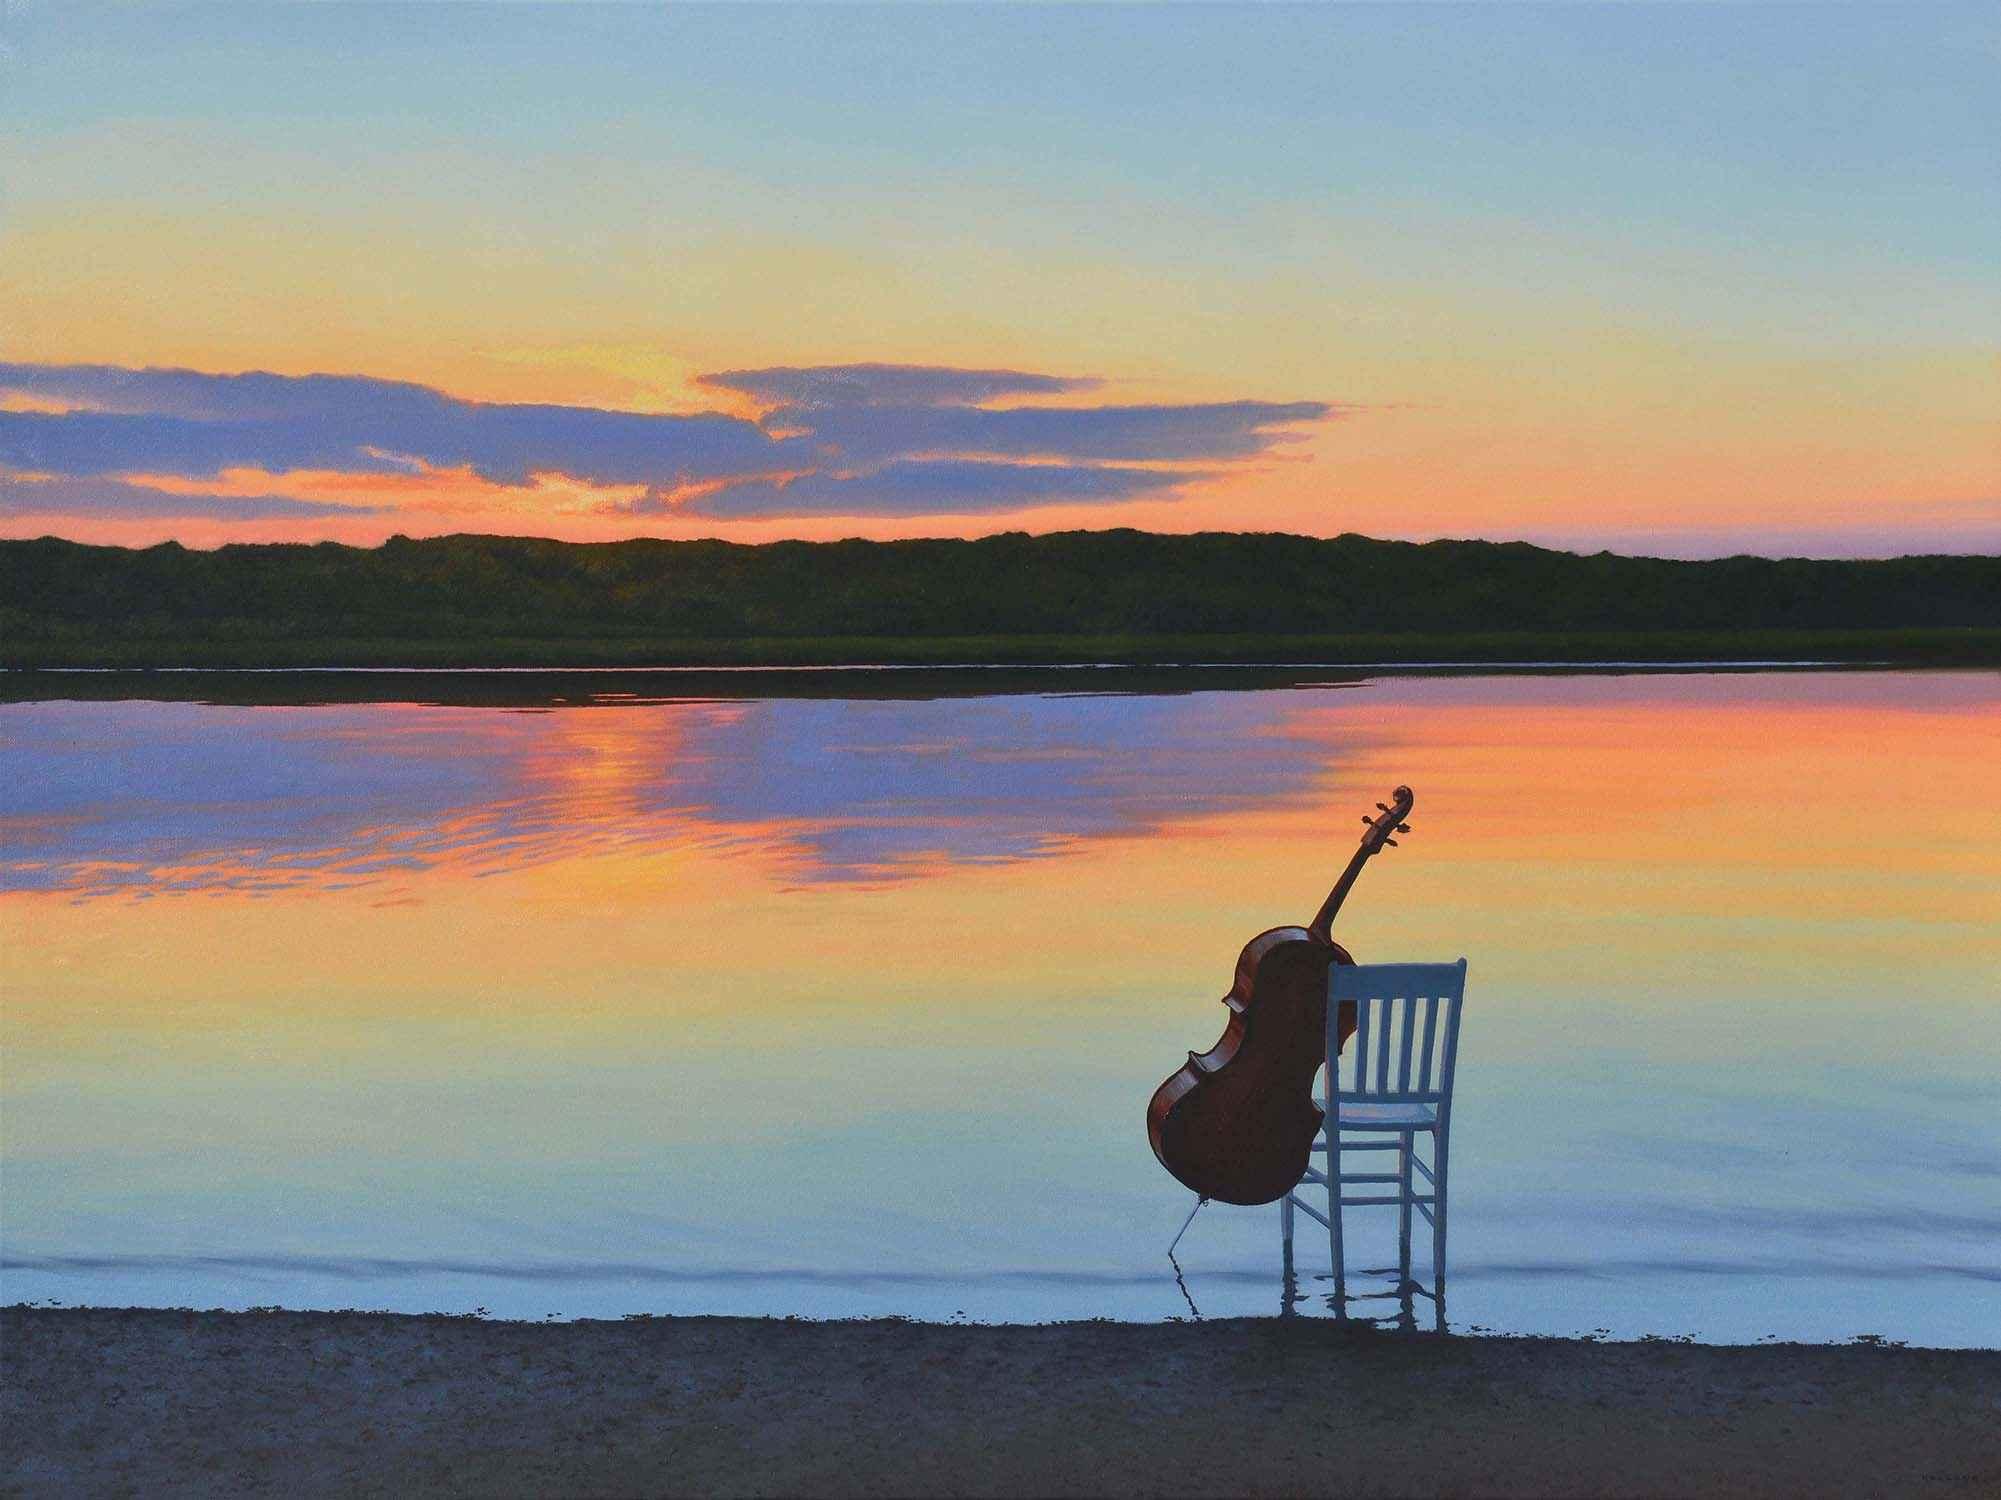 Sunset Sonata by  Jim Holland - Masterpiece Online